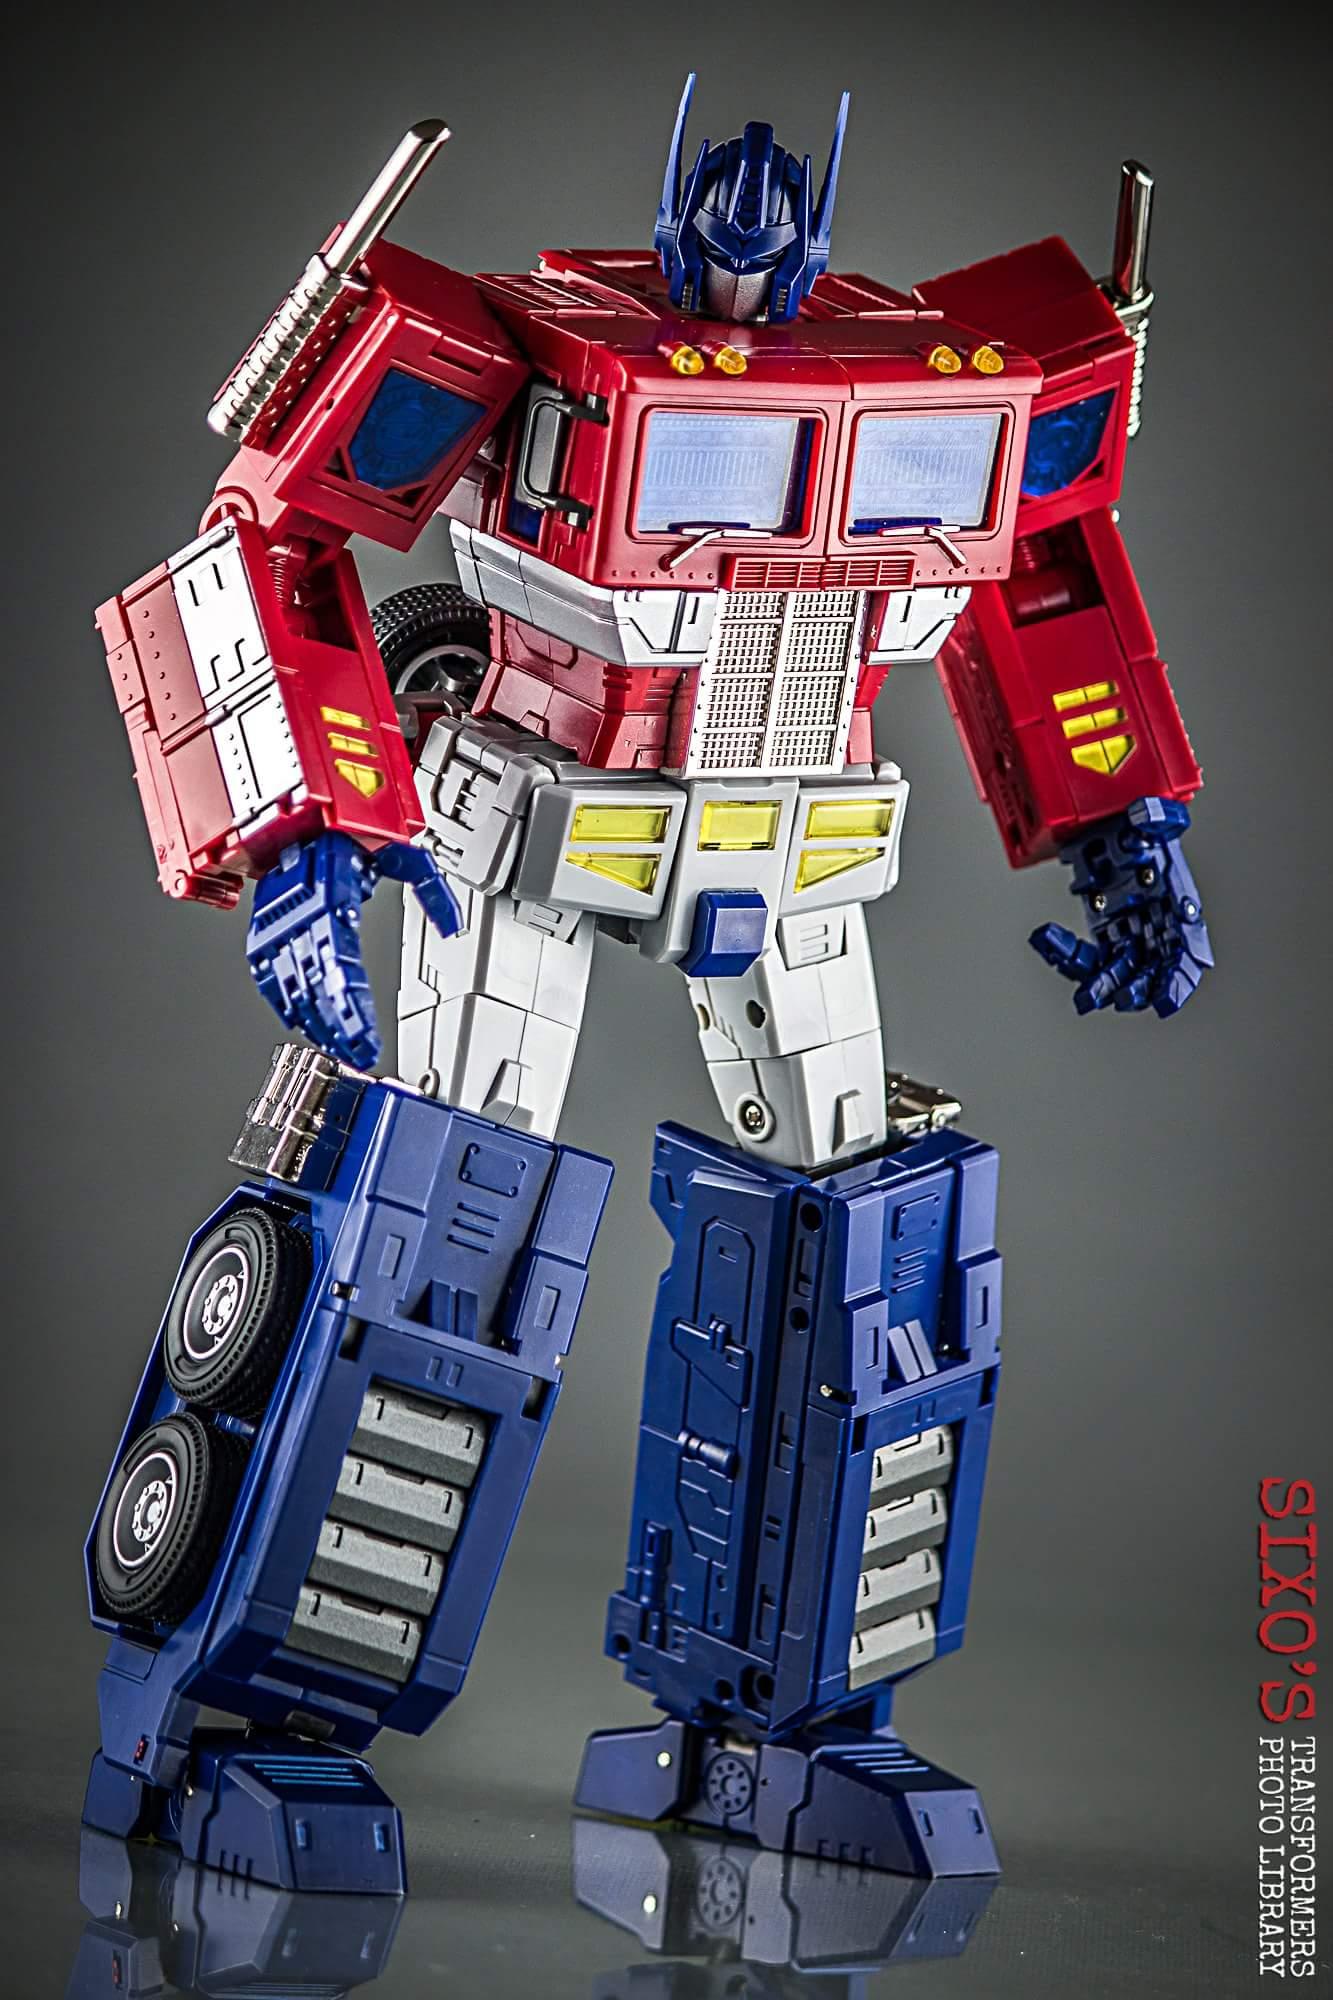 [ToyWorld][ZetaToys] Produit Tiers - TW-M01 Primorion/Zeta-EX6O OriPrime et Zeta -EX6E EvaPrime - aka Optimus (G1 et Evangelion) - Page 3 BUUPRjzl